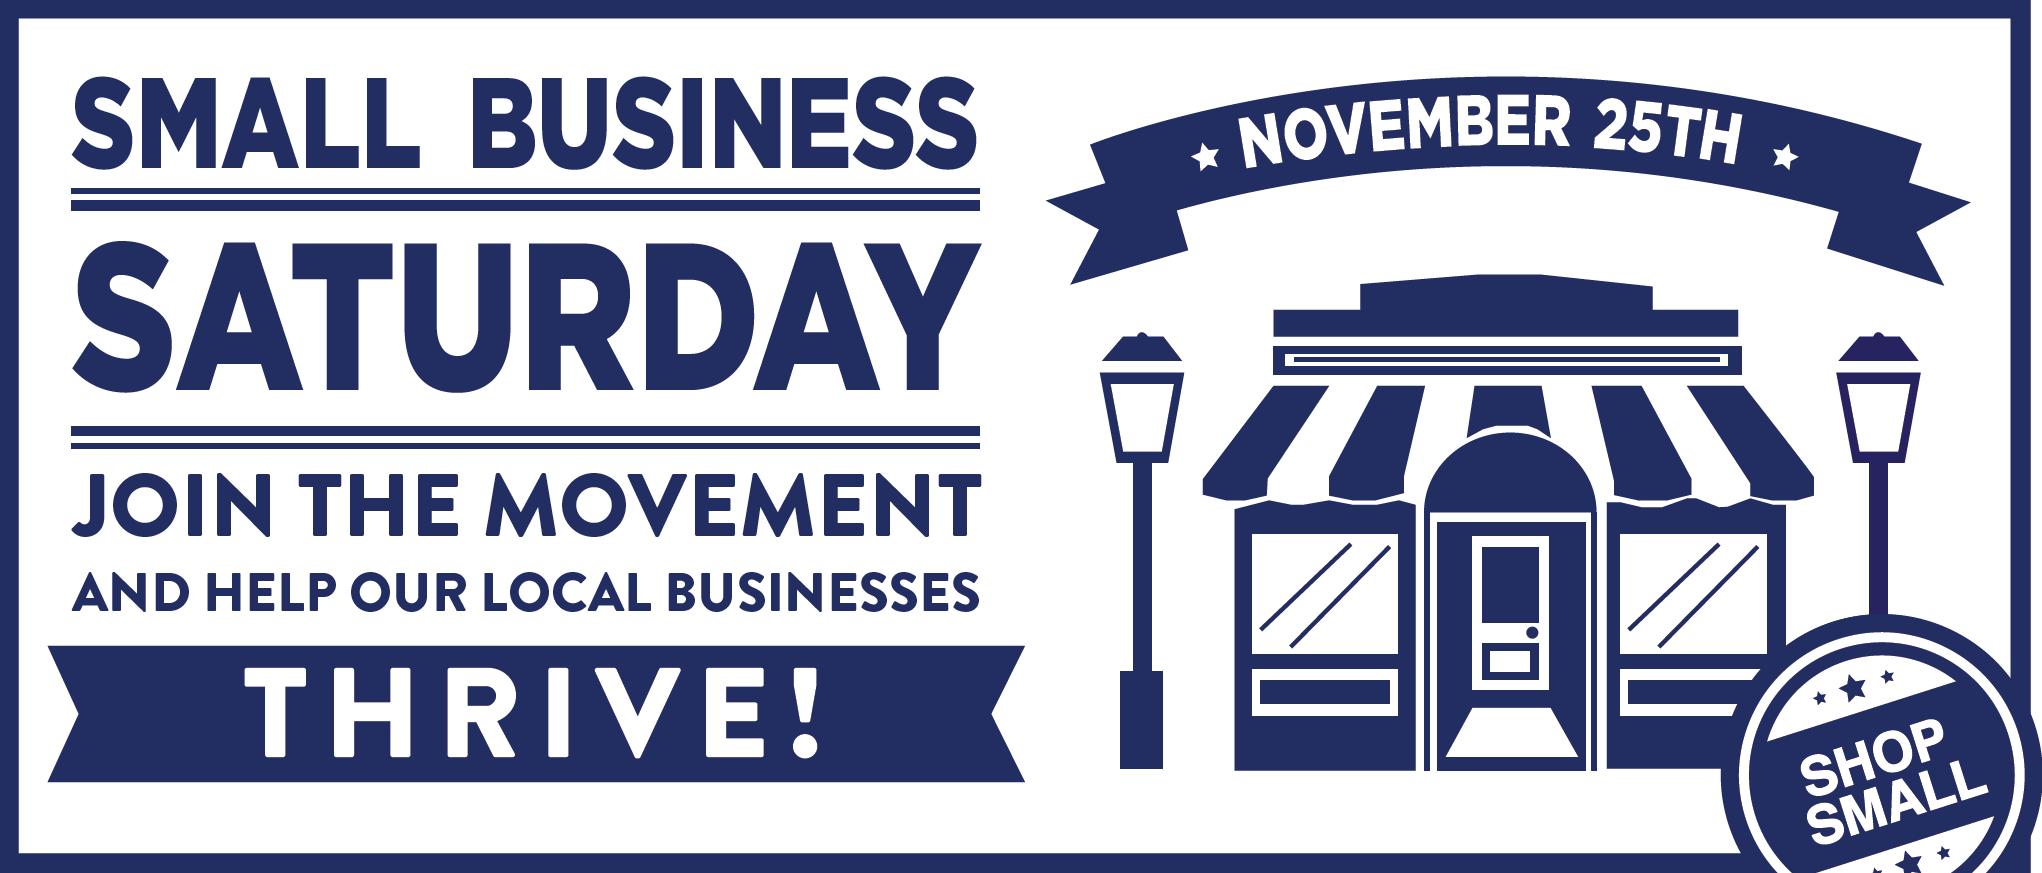 4cea921c21f12ab7ba48_Small-Business-Saturday-11-25-2017.jpg